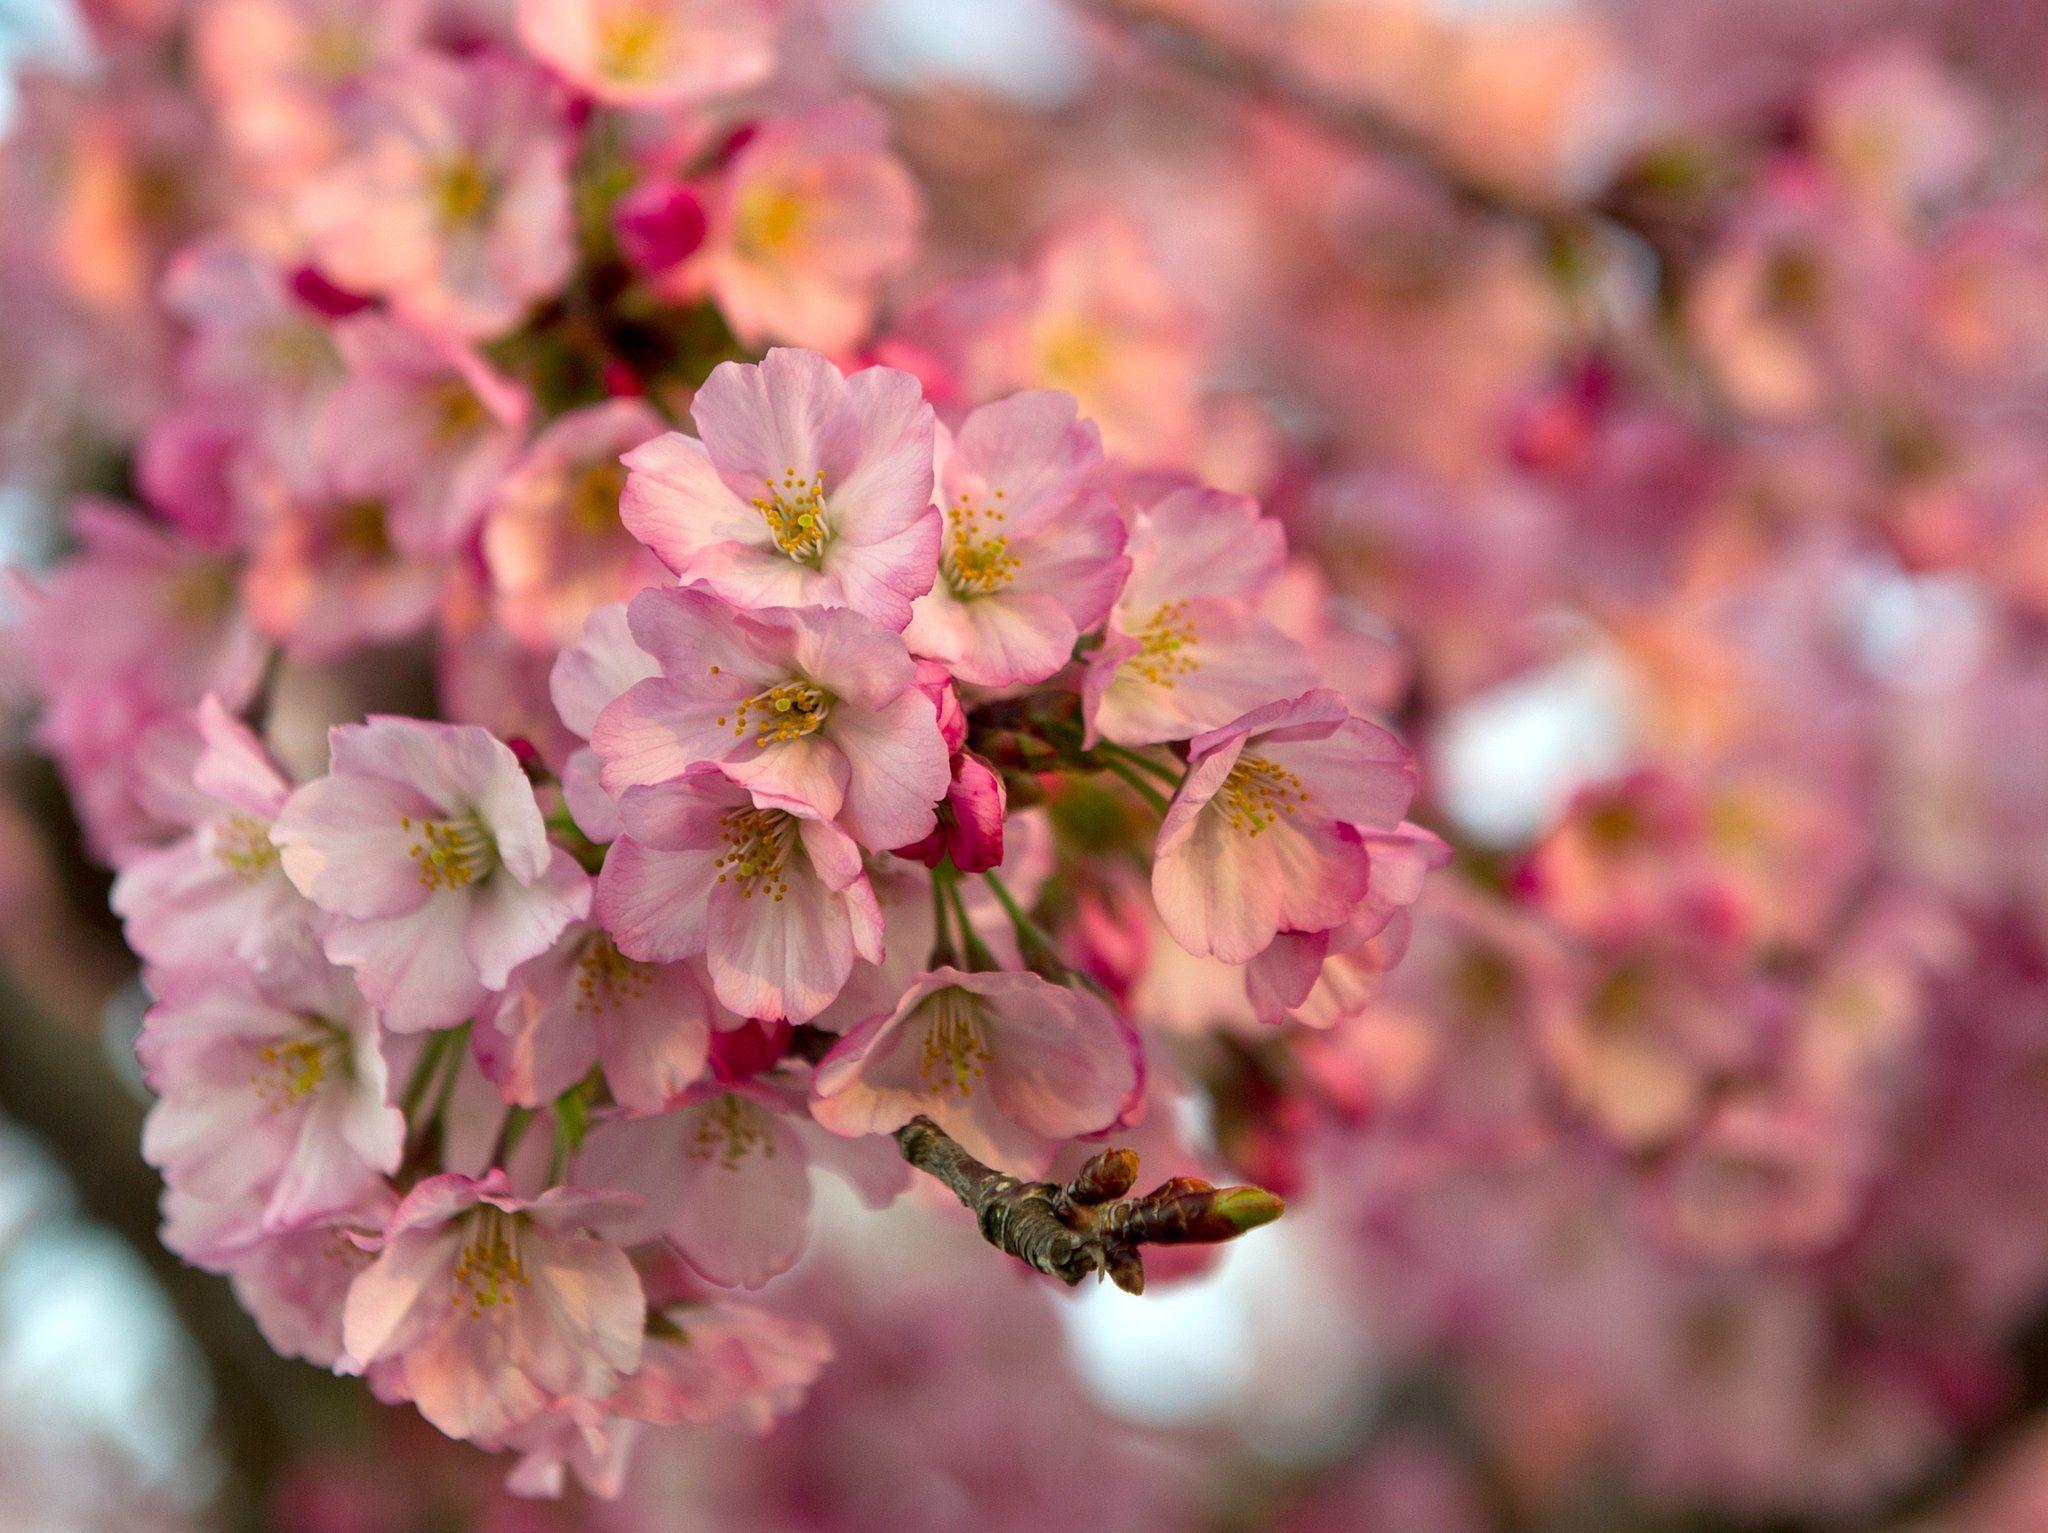 Washington Dc Cherry Blossom Photos Mini Session Sea Of Blush Mini Photo Sessions Photo Sessions Cherry Blossom